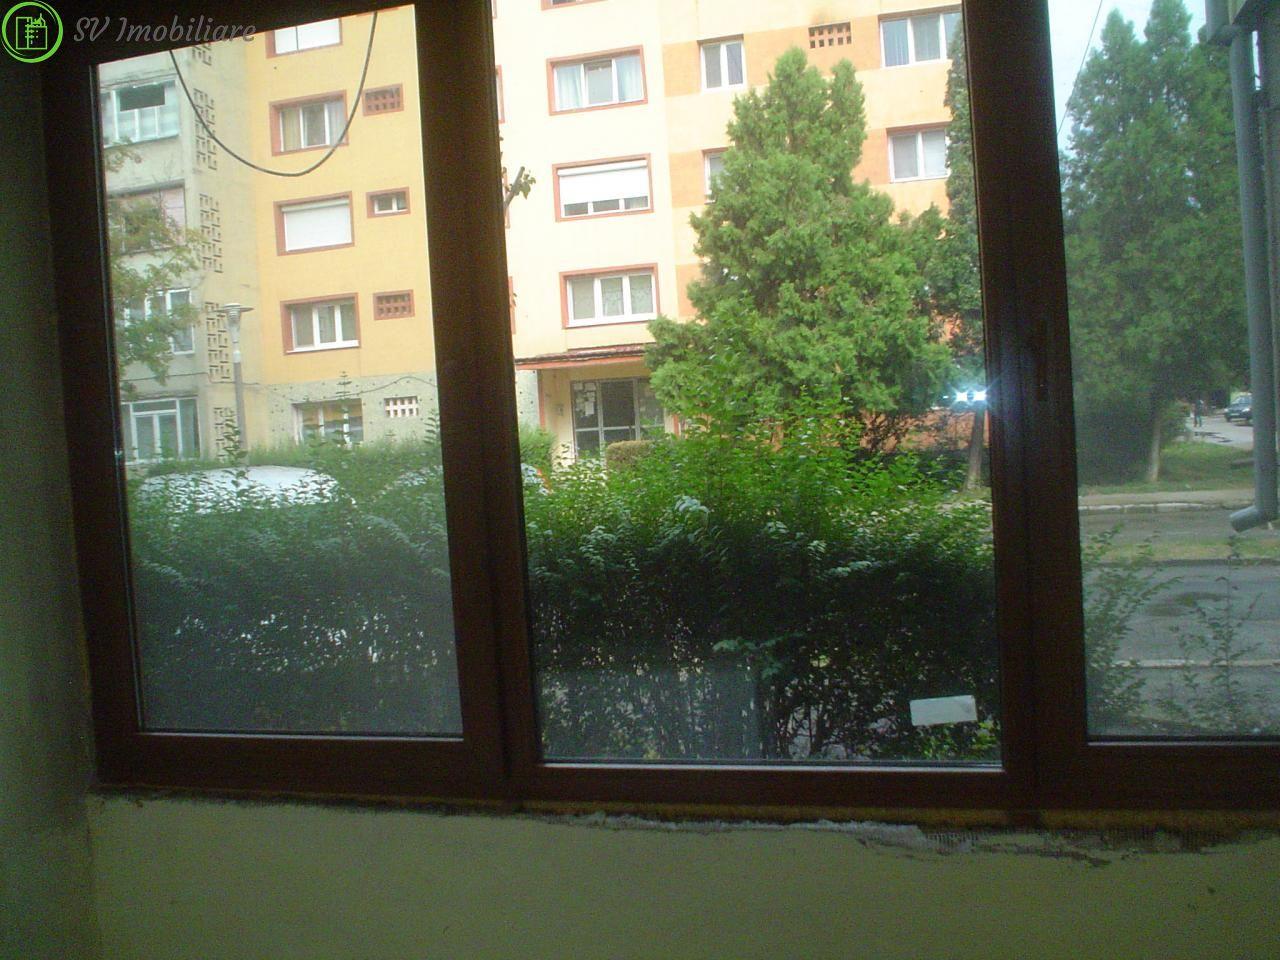 Apartament de vanzare, Caraș-Severin (judet), Caransebeş - Foto 12